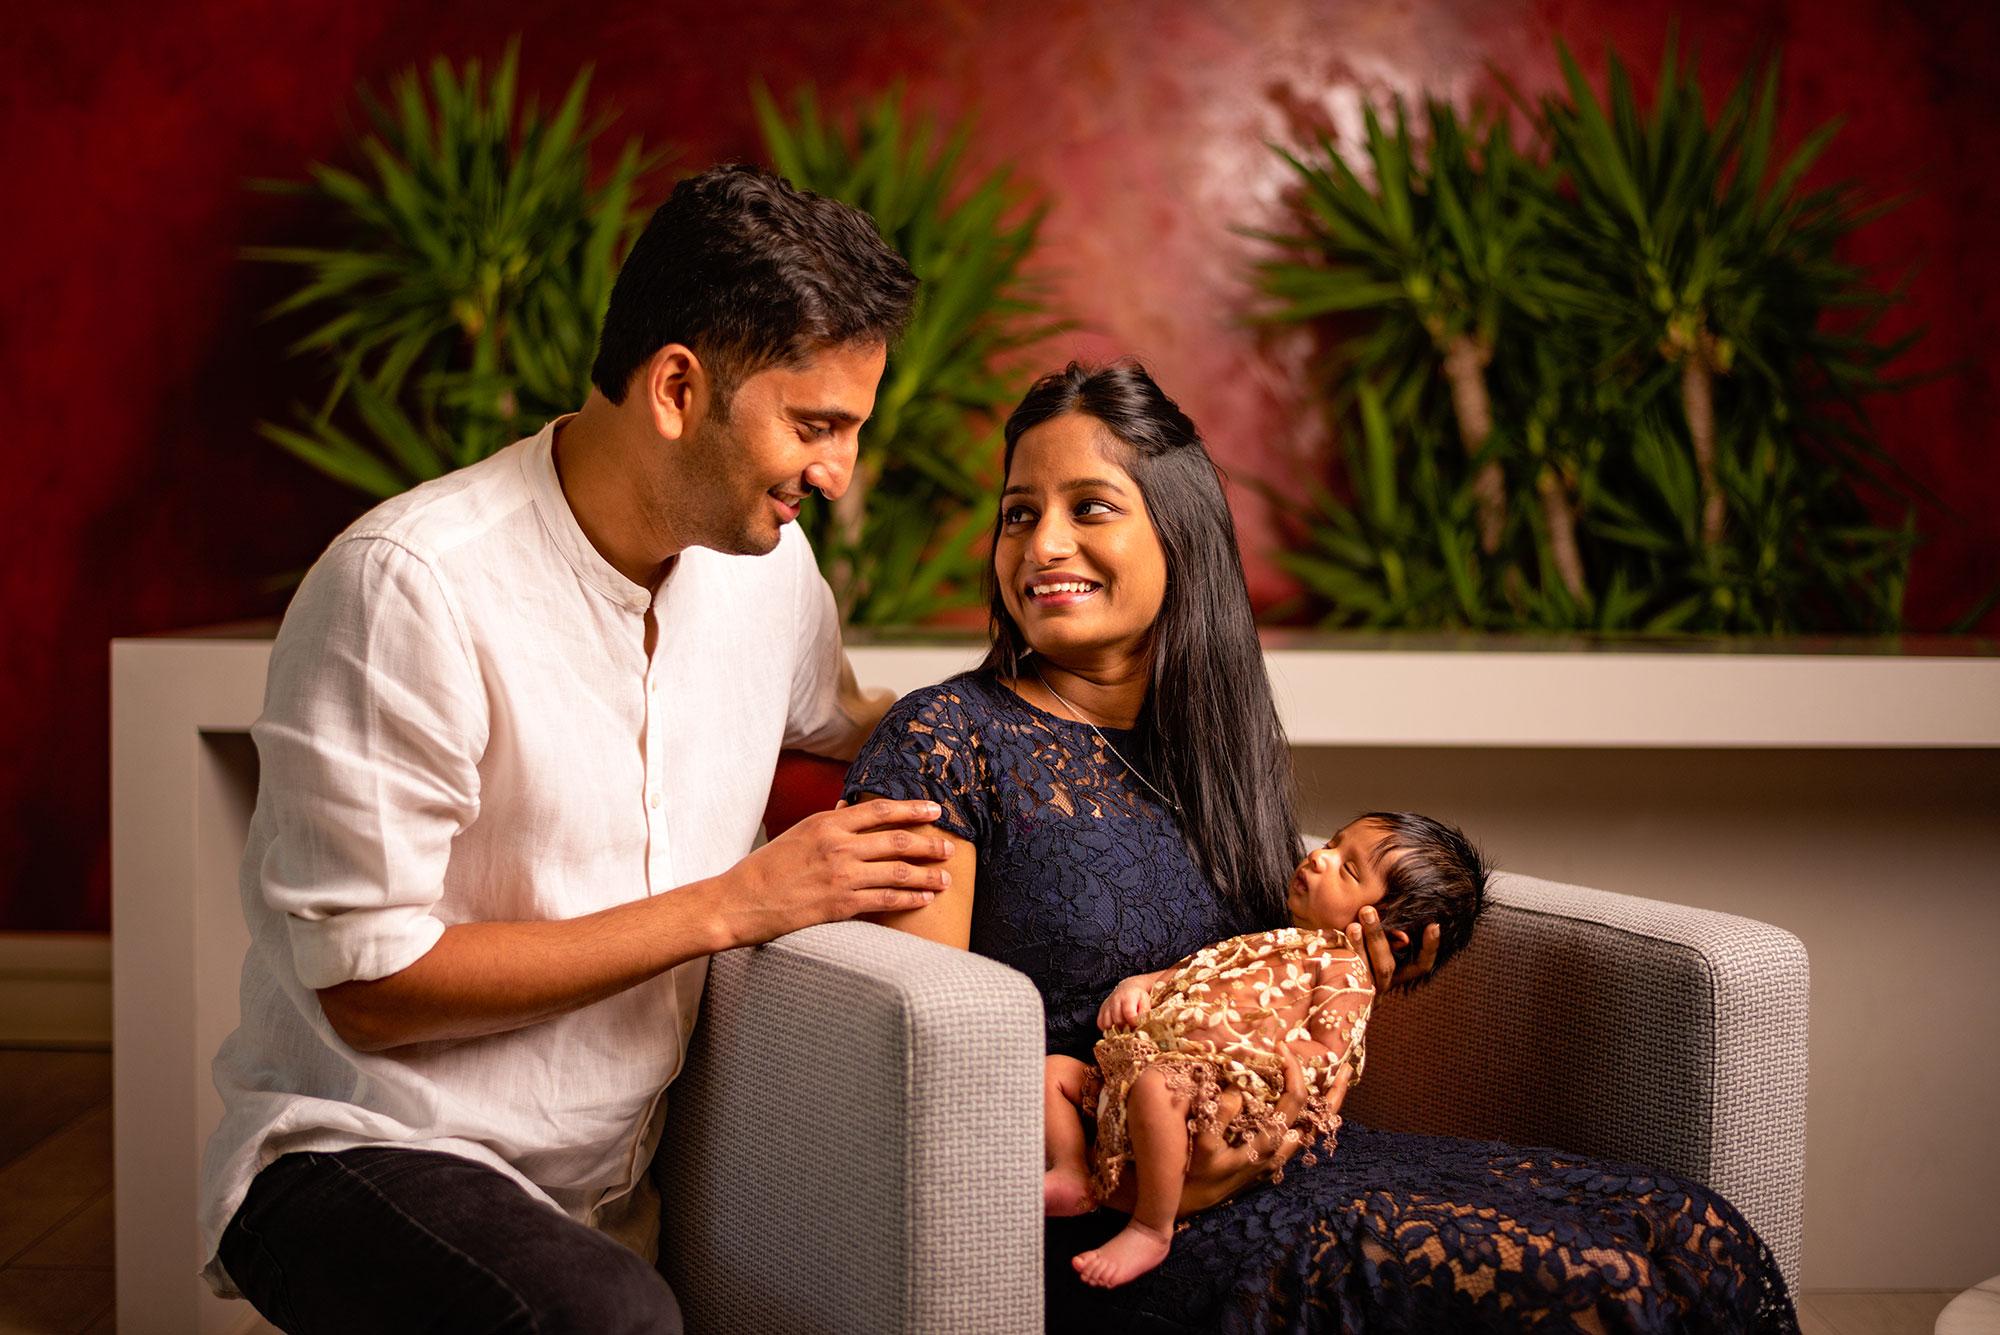 https://bworthyphotography.smugmug.com/BW-Website-Newborn-Session/Kumar-Newborn-Session